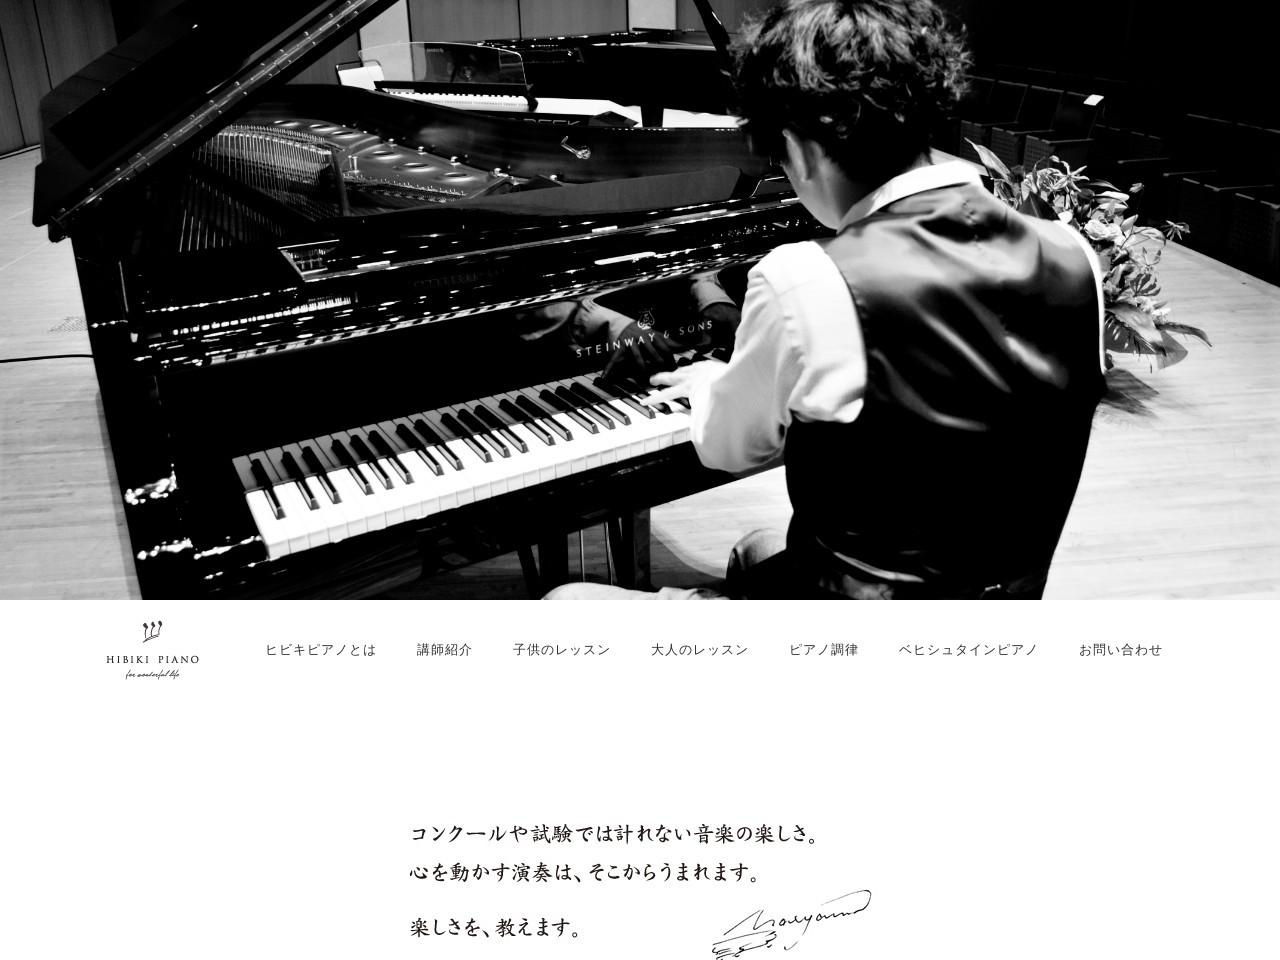 HIBIKI PIANOのサムネイル